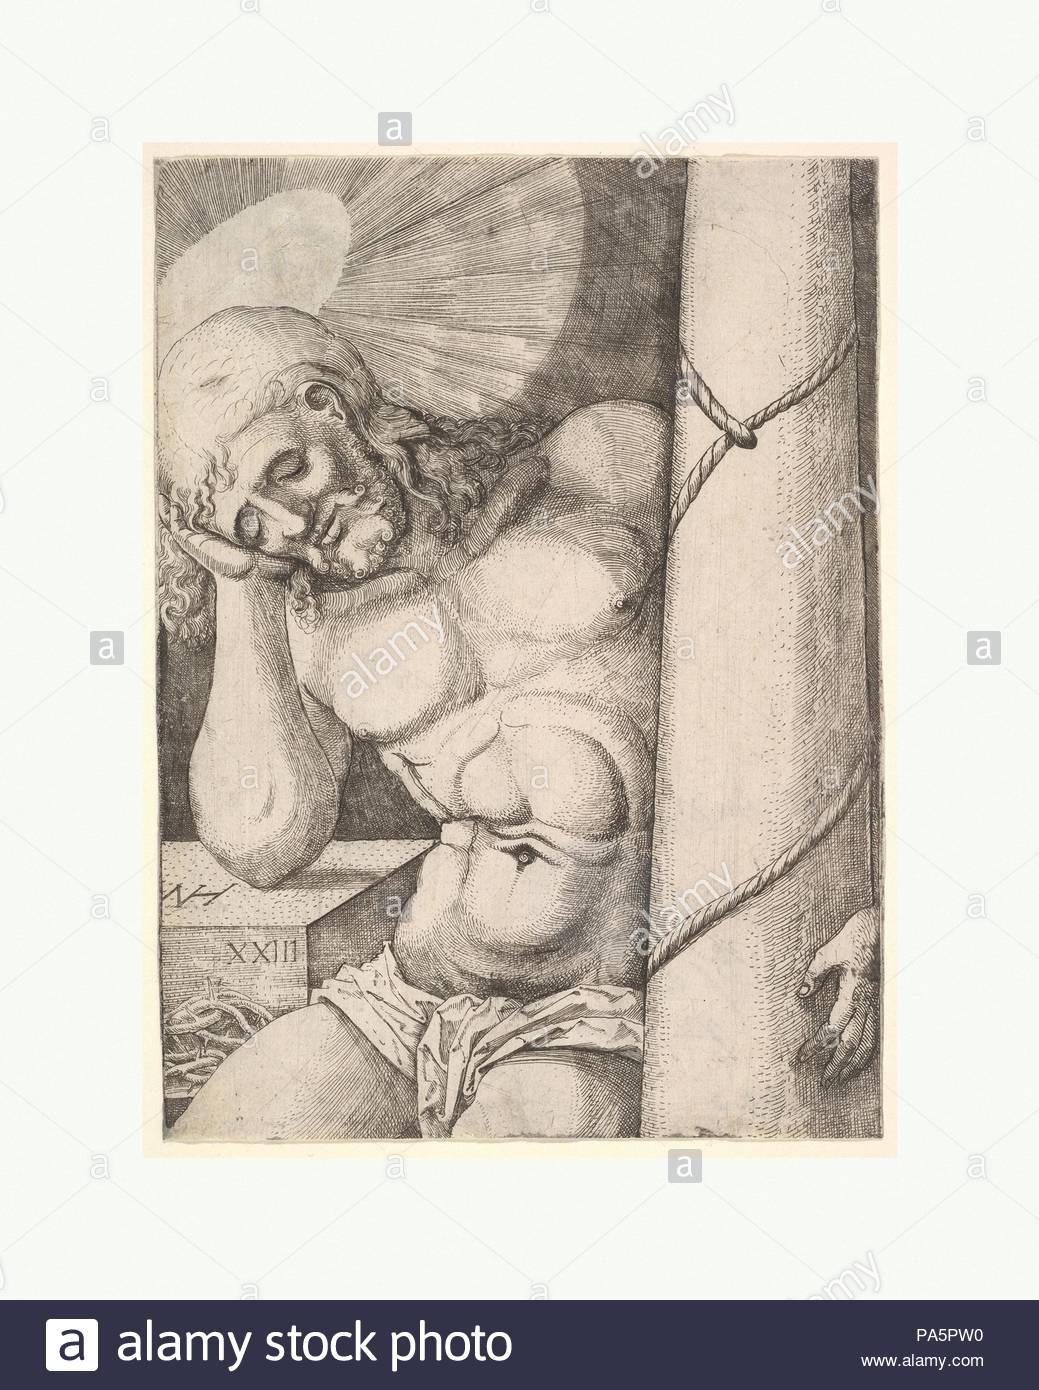 The Man of Sorrows at the Column, 1523, Etching, sheet: 6 5/16 x 4 5/8 in. (16 x 11.8 cm), Prints, Nikolaus Hogenberg (Netherlandish, Munich ca. 1500–1539 Mechelen). - Stock Image